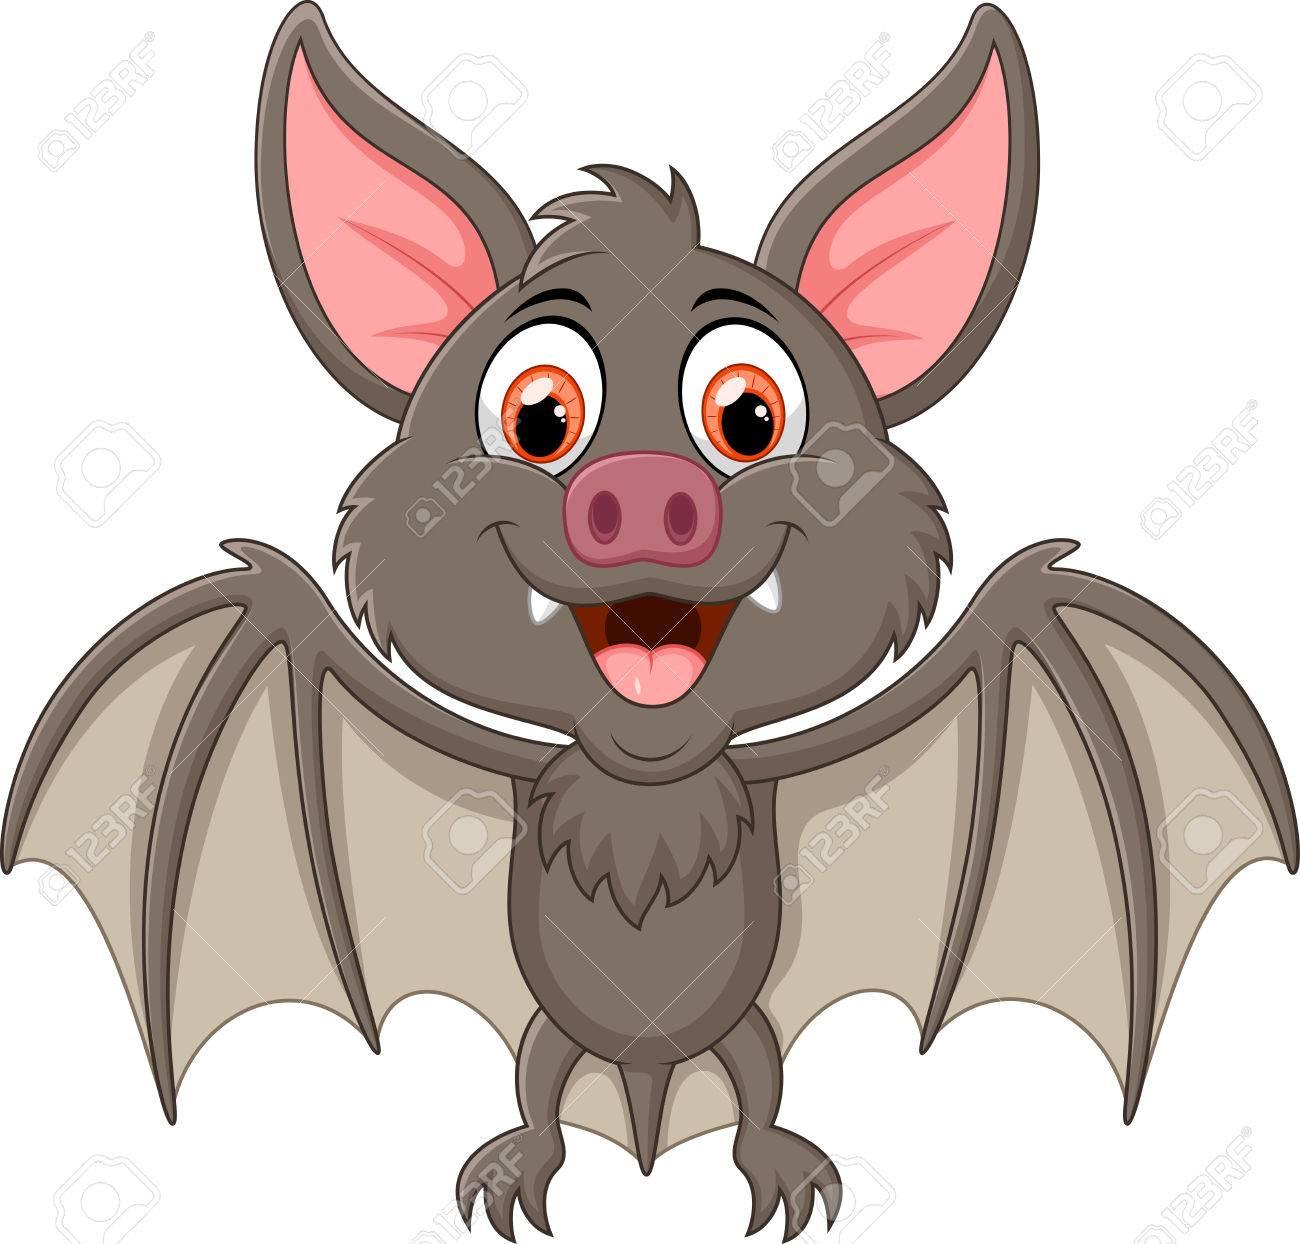 A Picture Of A Cartoon Bat happy vampire bat cartoon character flying